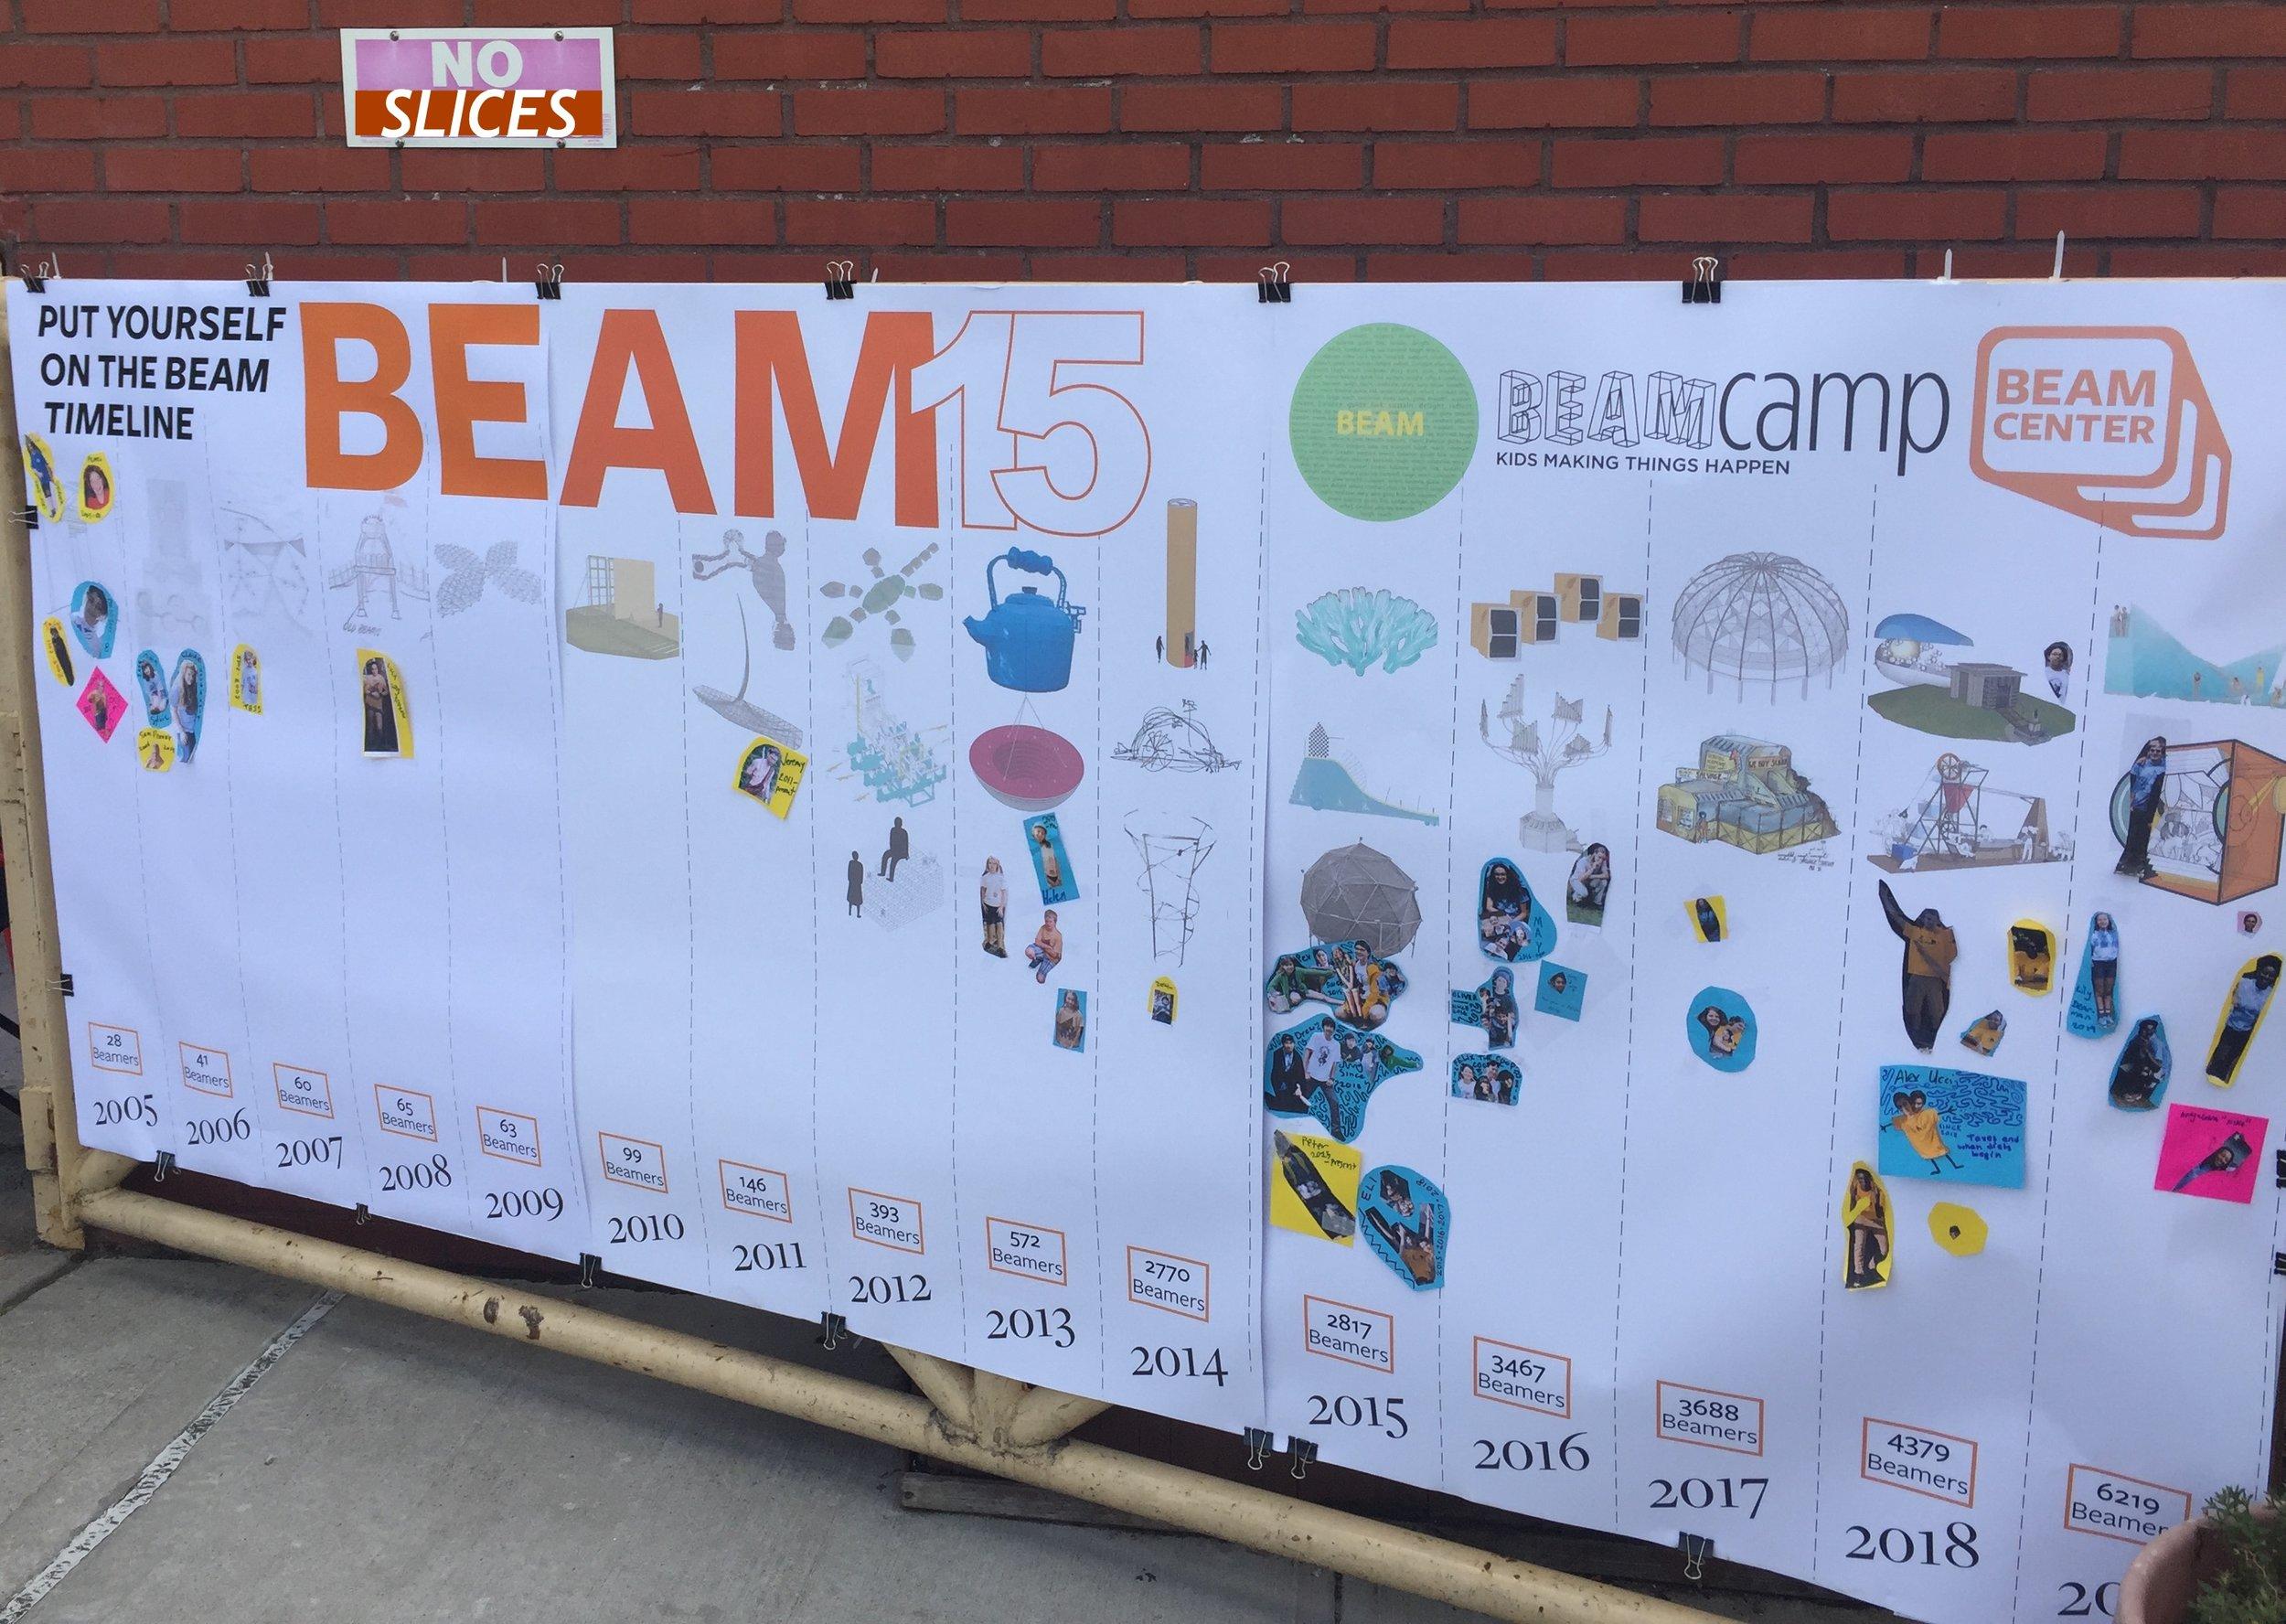 beam 15 timeline.JPG